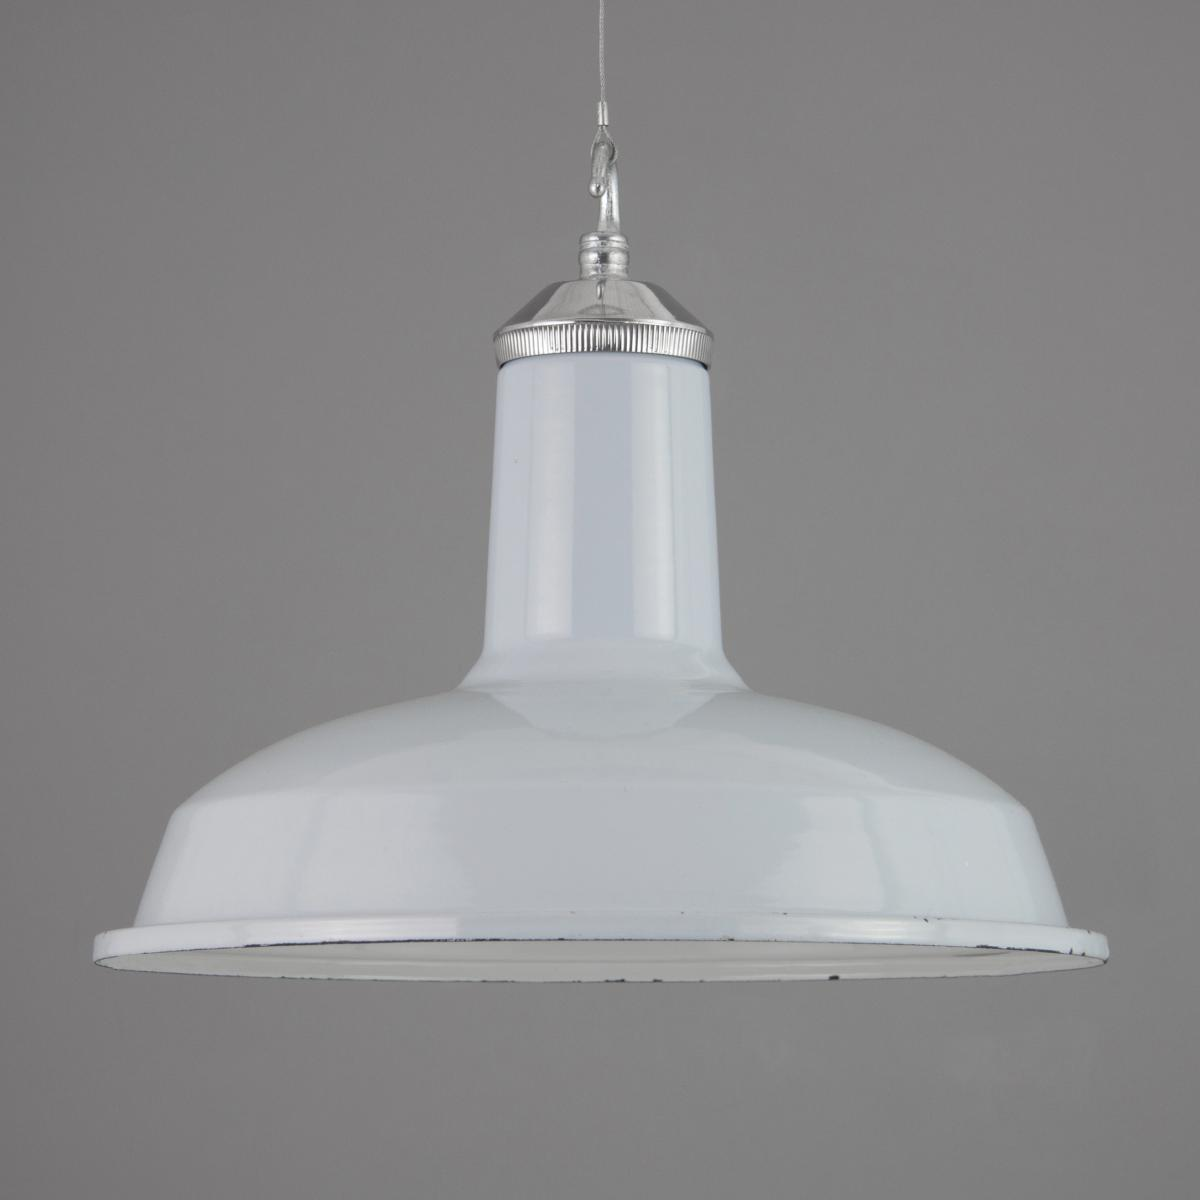 Pale blue vintage enamel pendant lights